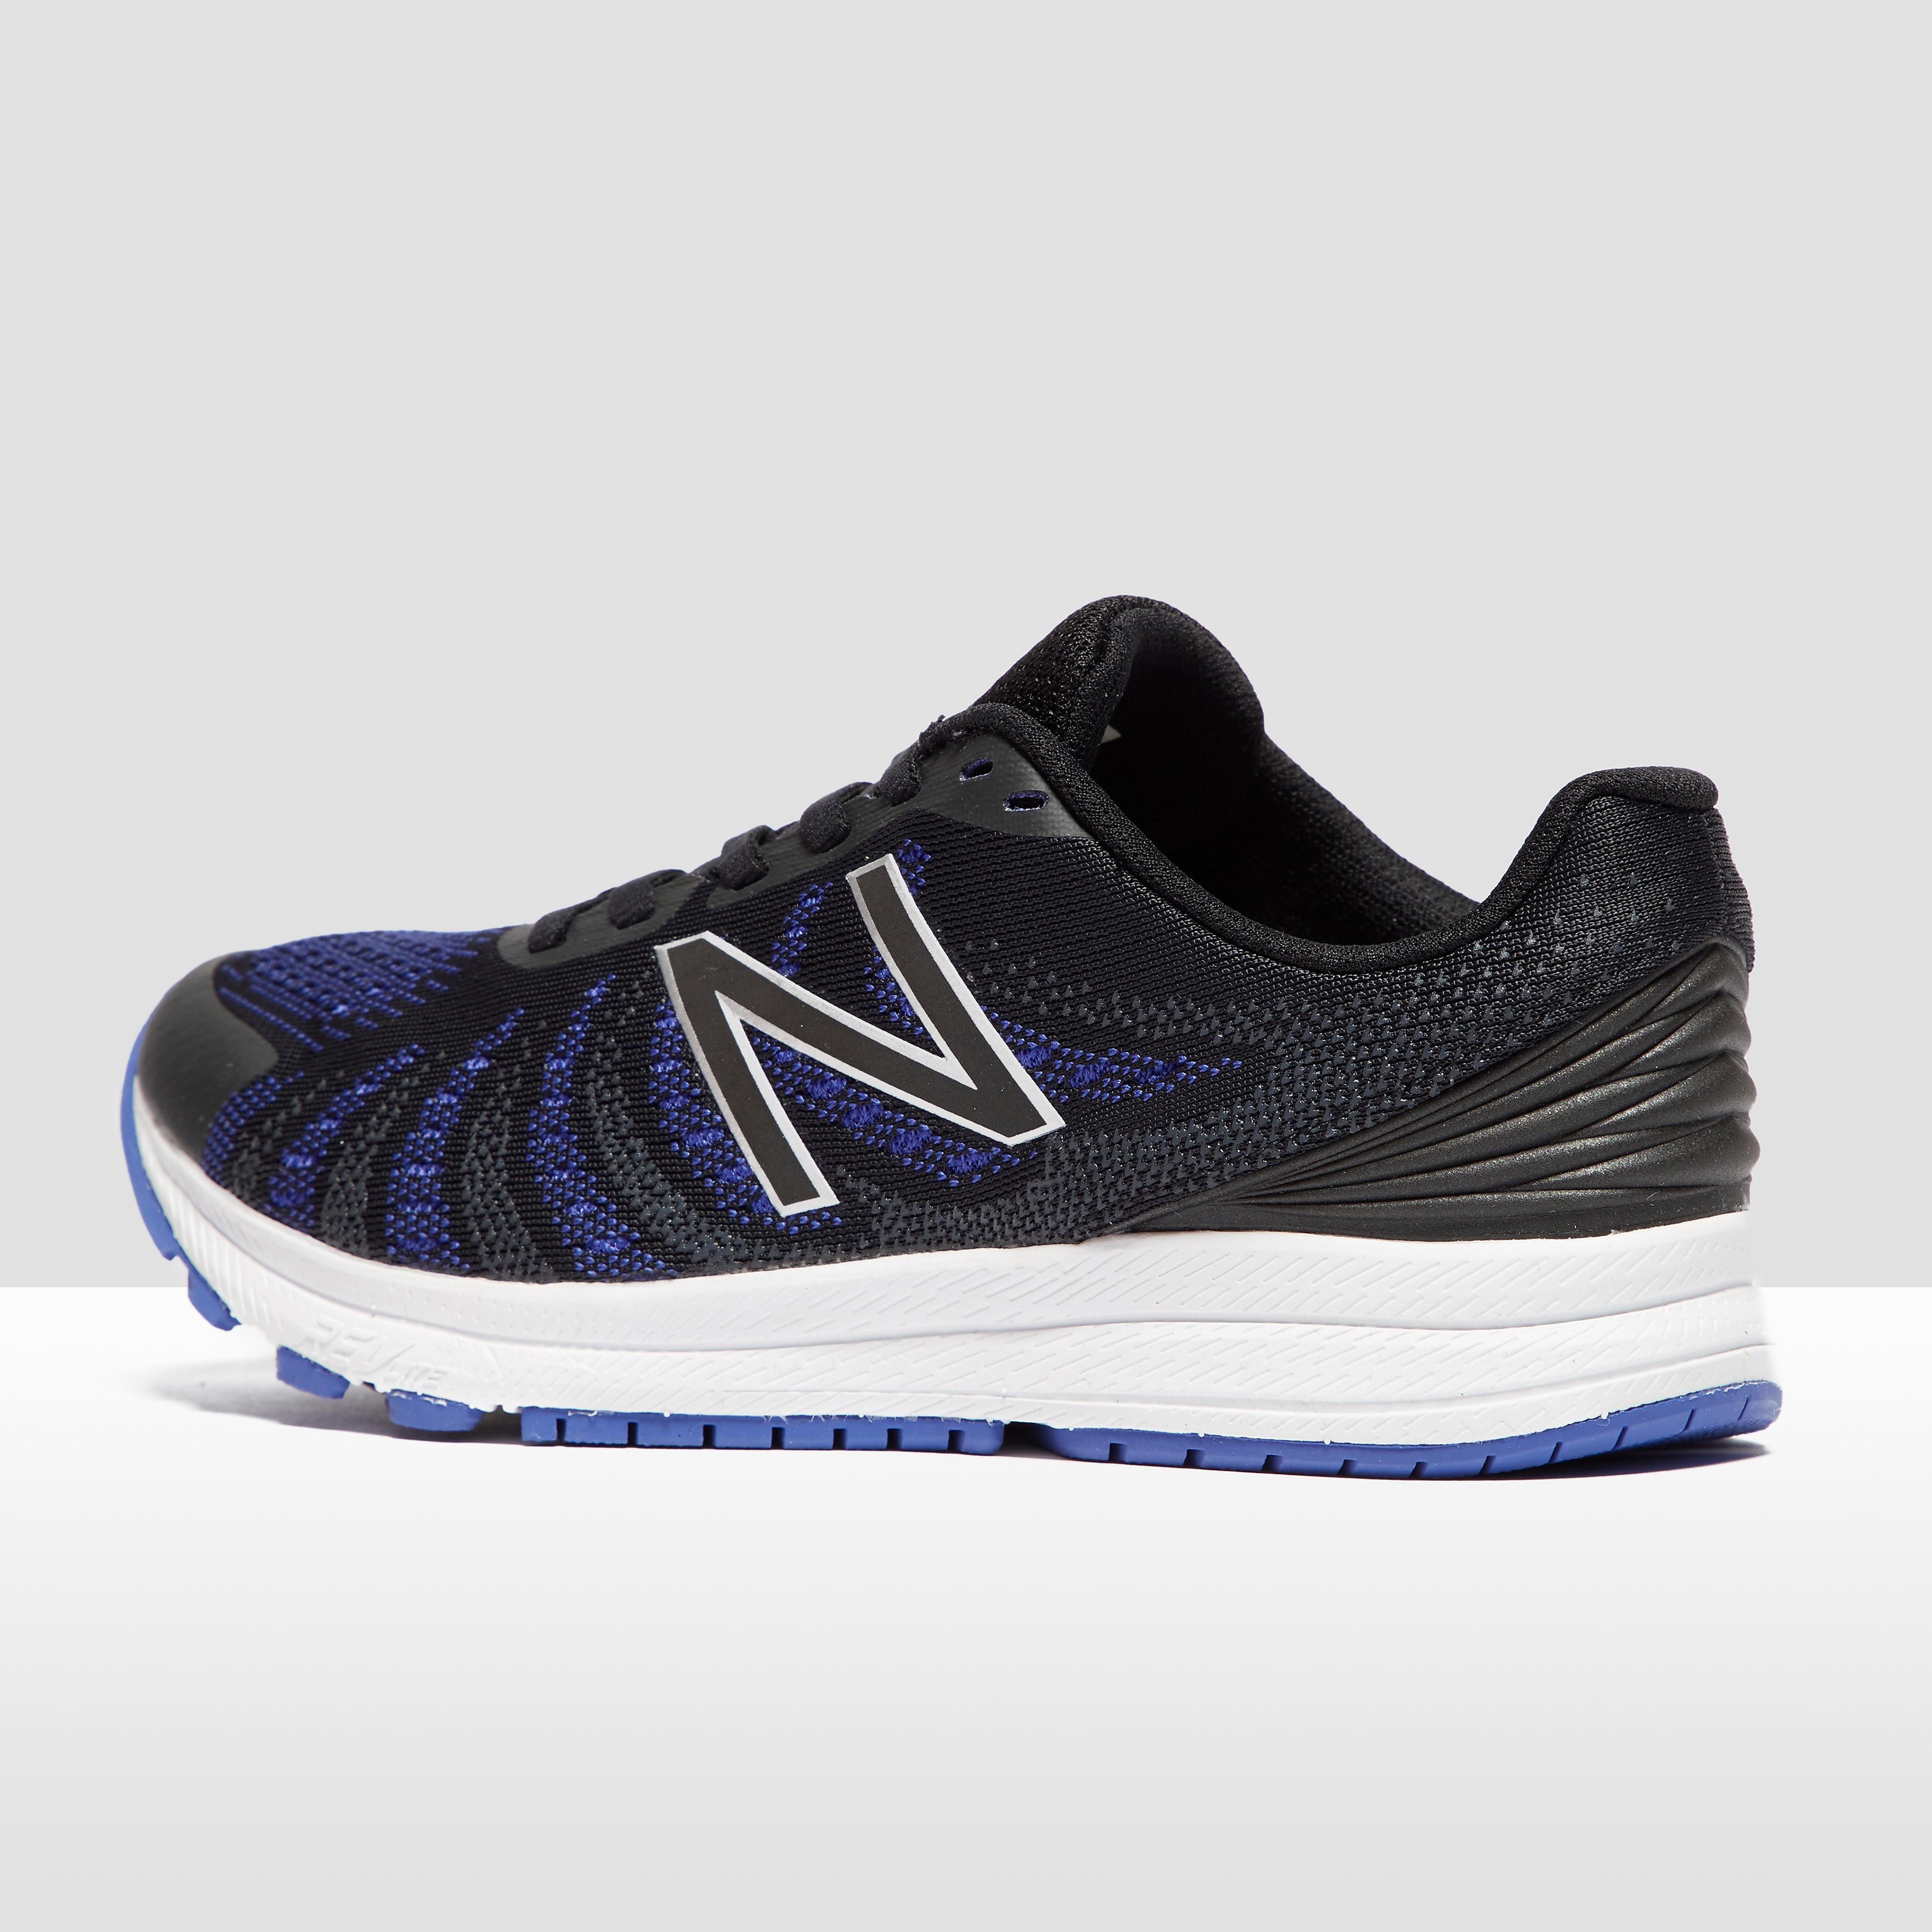 New Balance FuelCore Rush v3 Women's Running Shoes